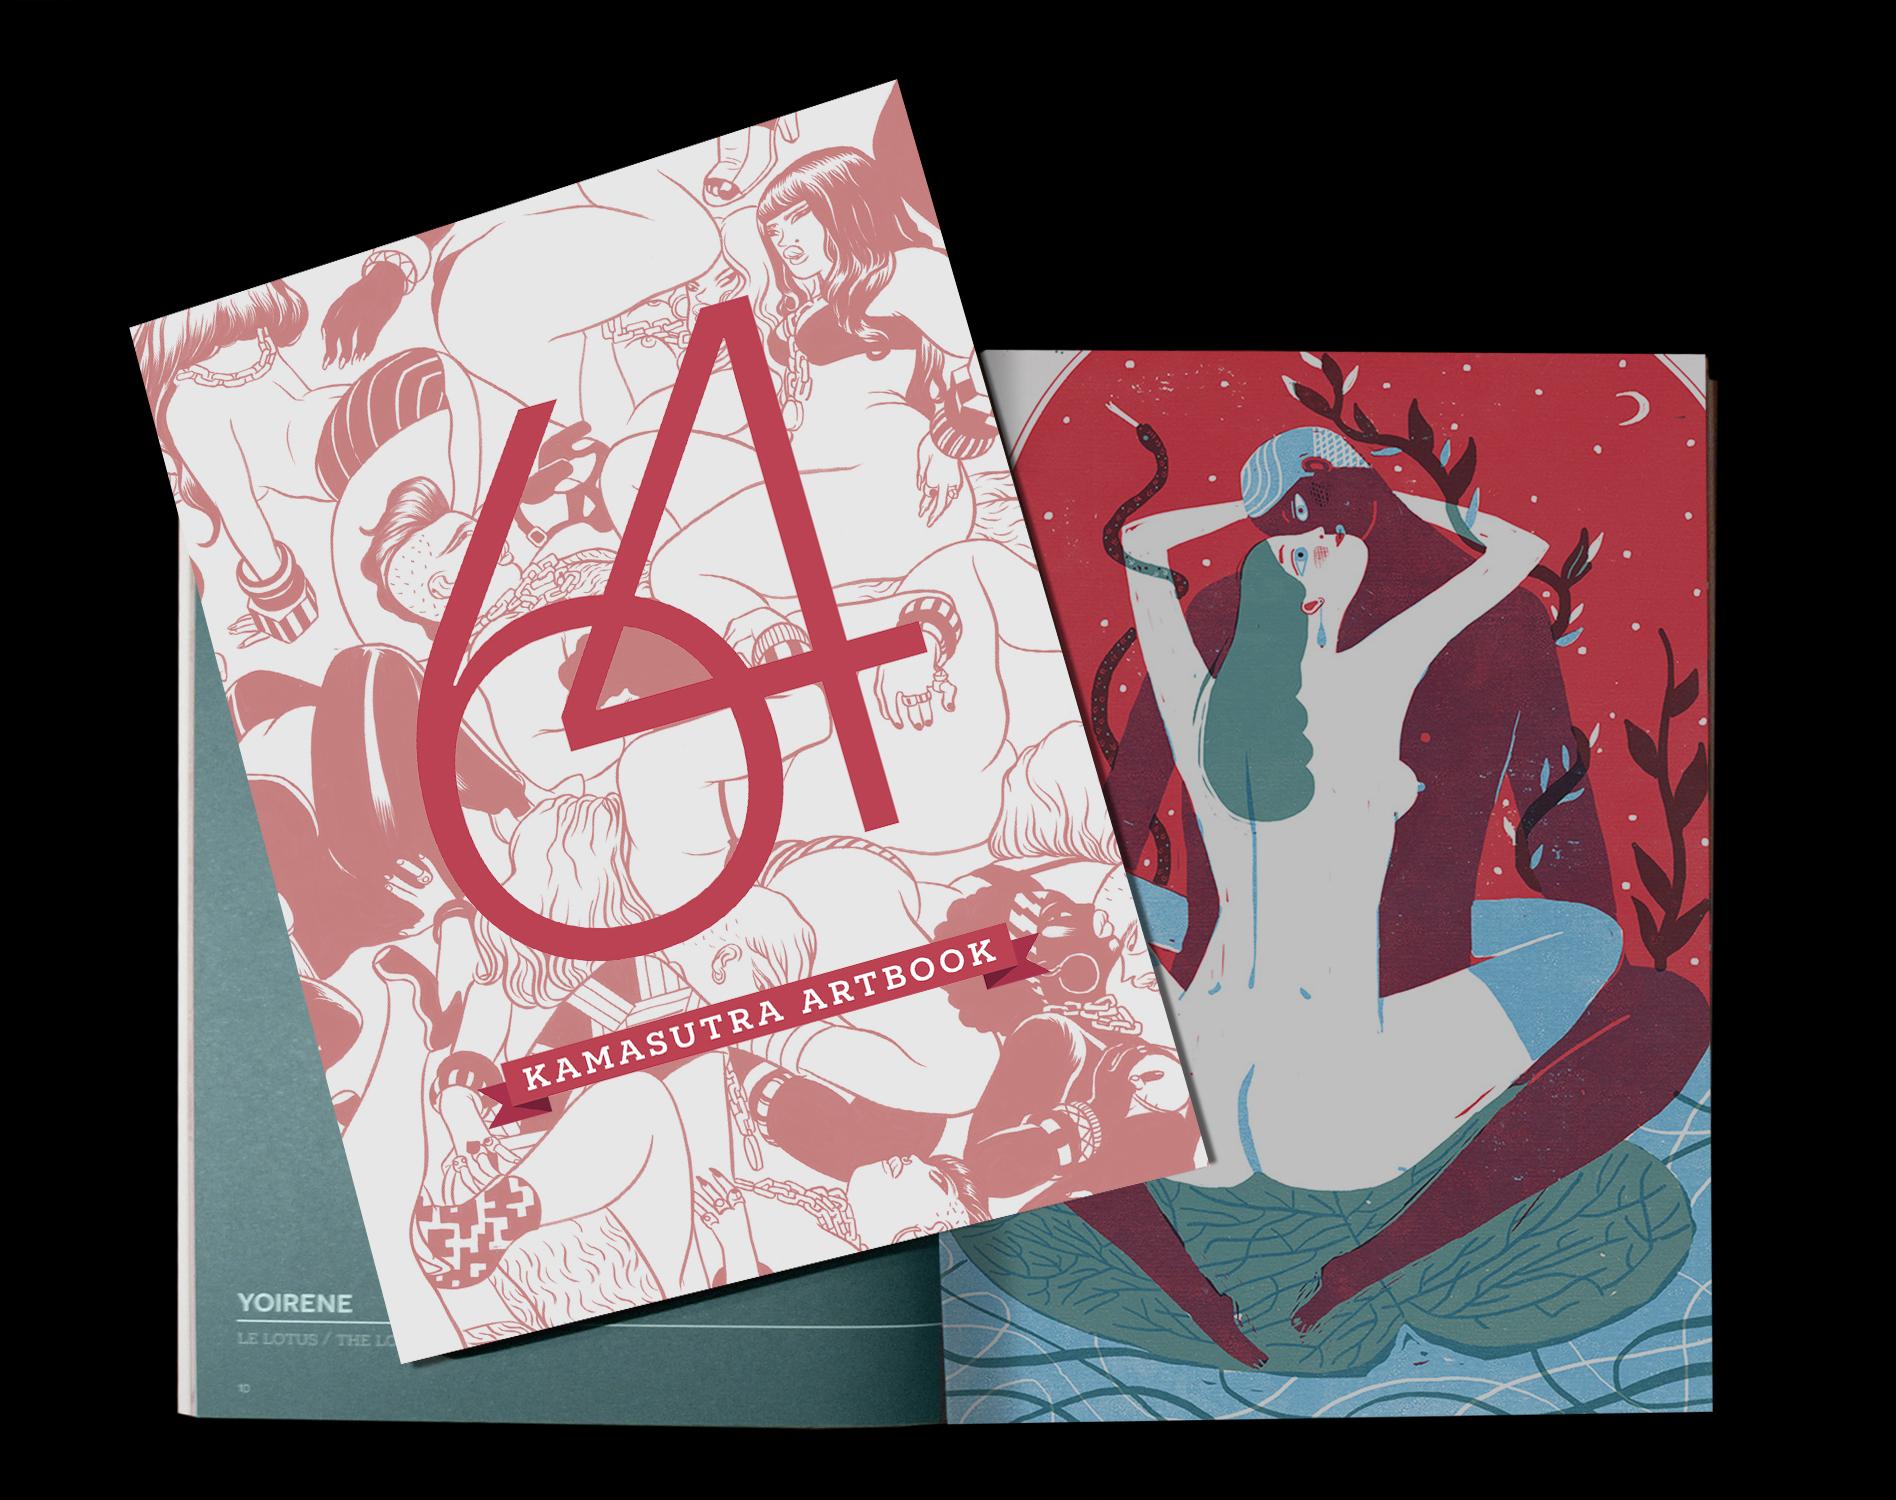 64 kamasutra artbook KAMASUTRA ART BOOK   64 artisti interpretano le posizioni delleros